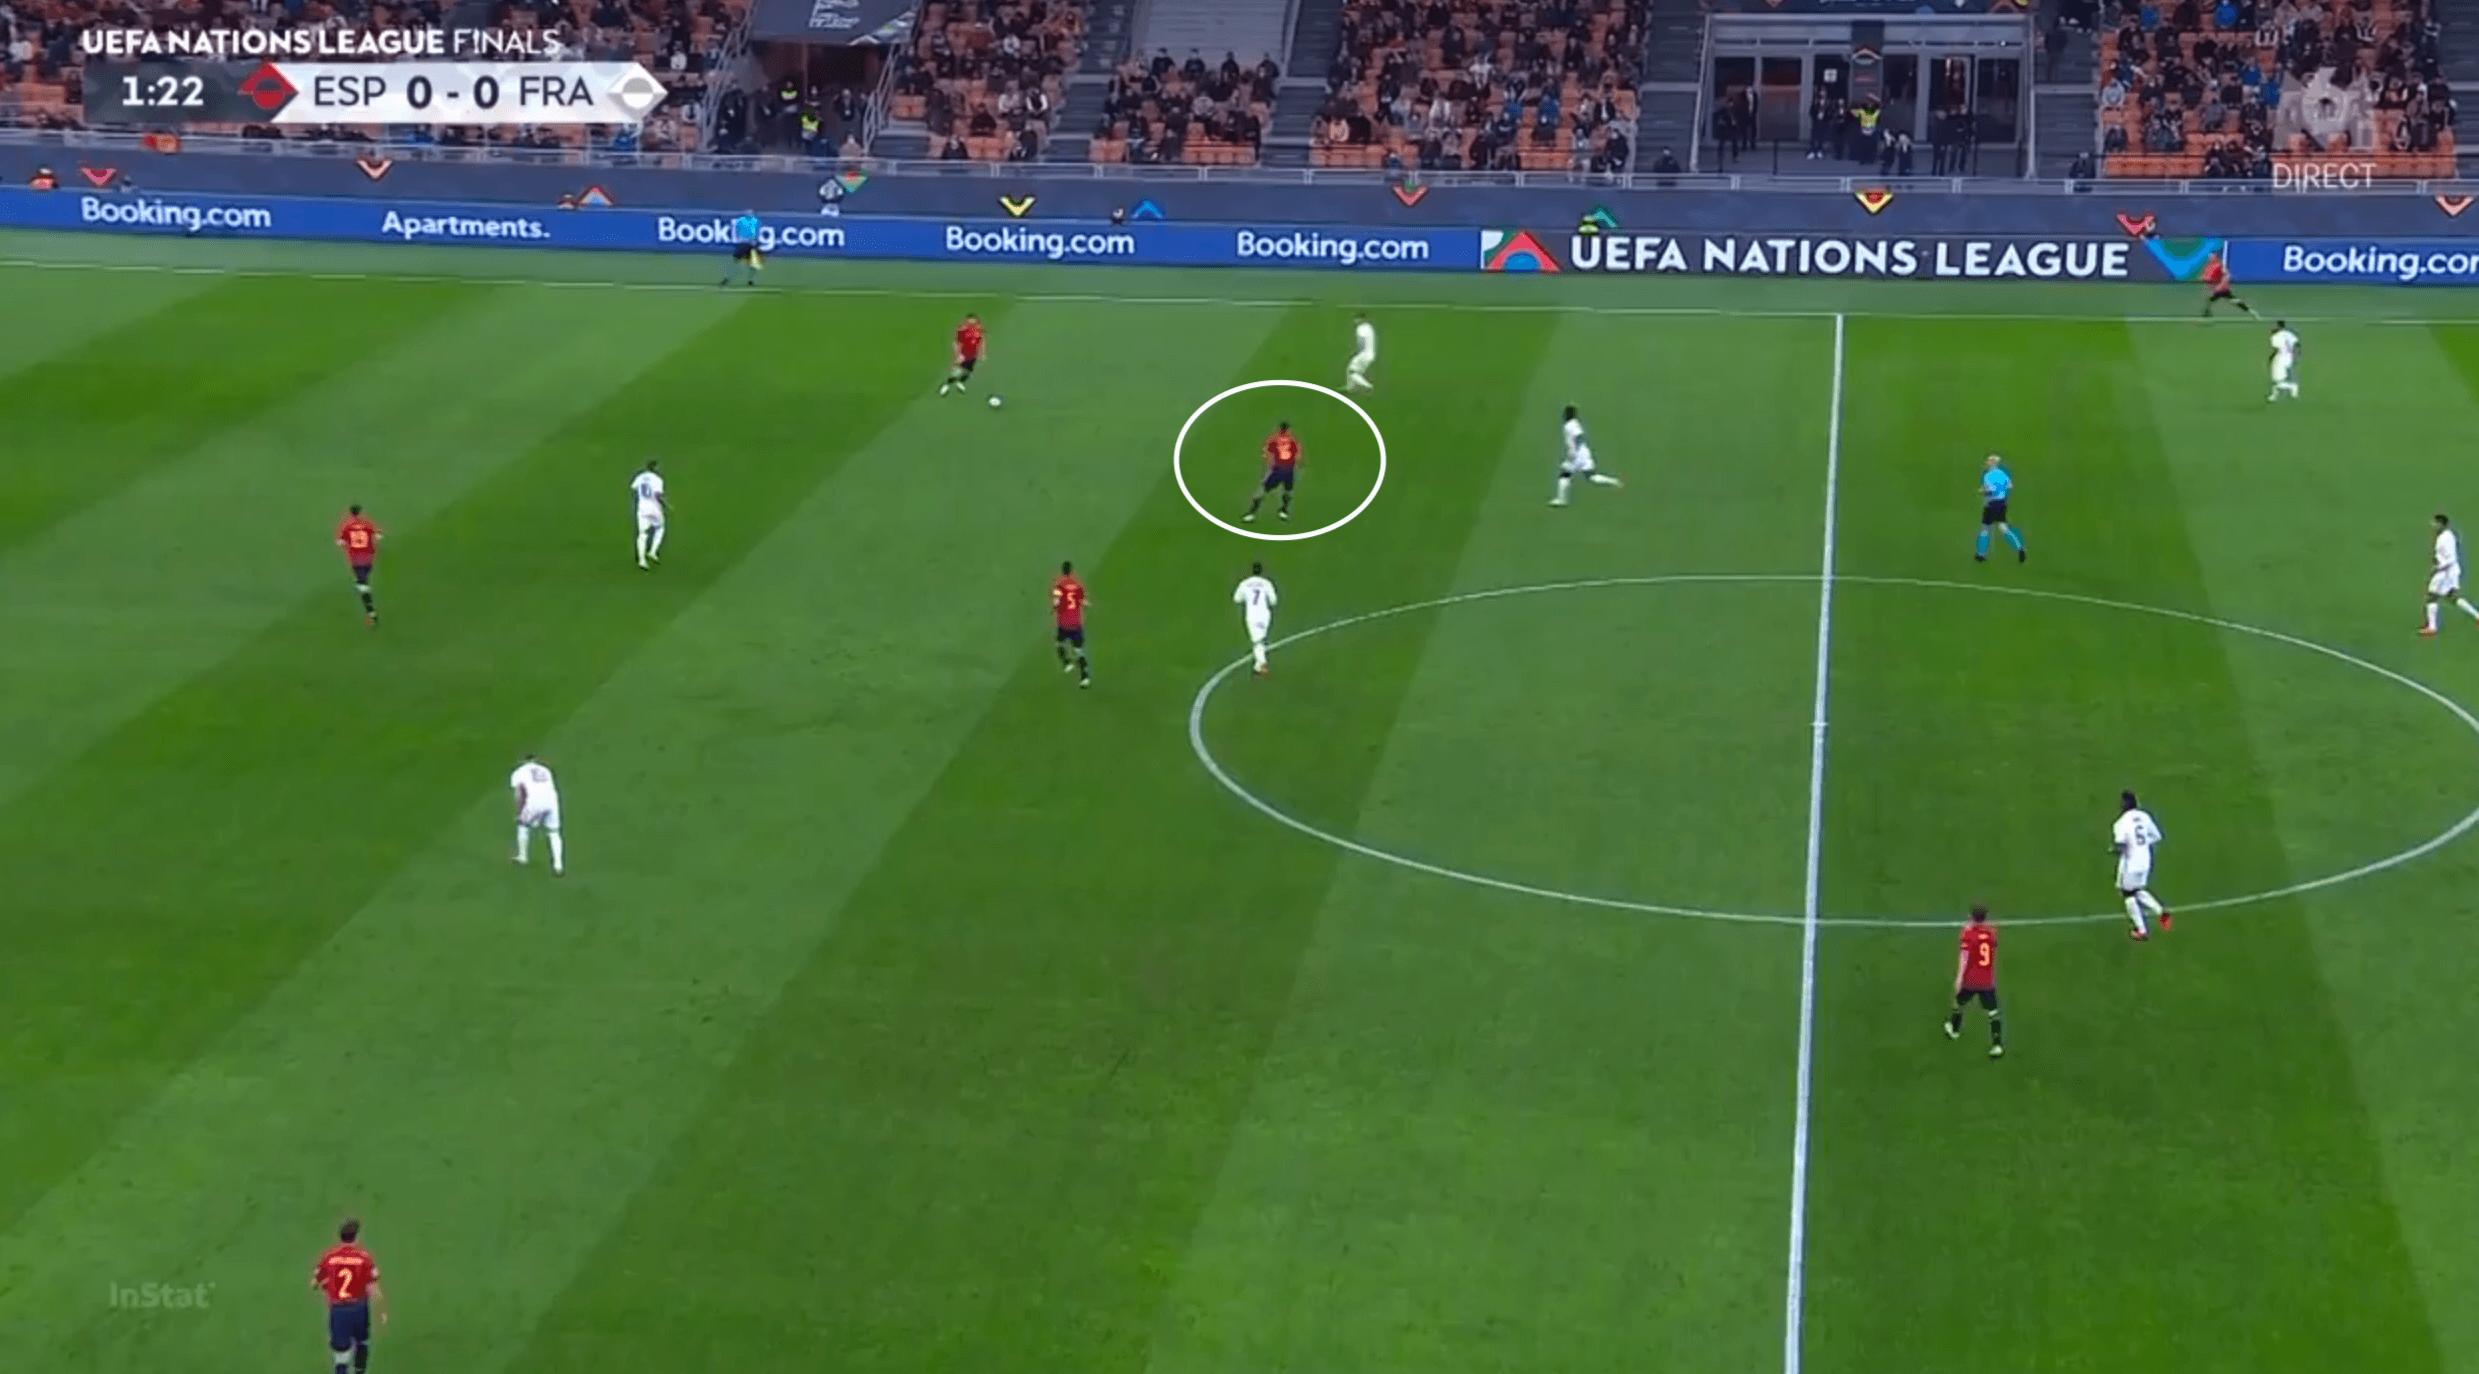 UEFA Nations League 2021/22: France's individual excellence triumphs over Enrique's Spain - tactical analysis